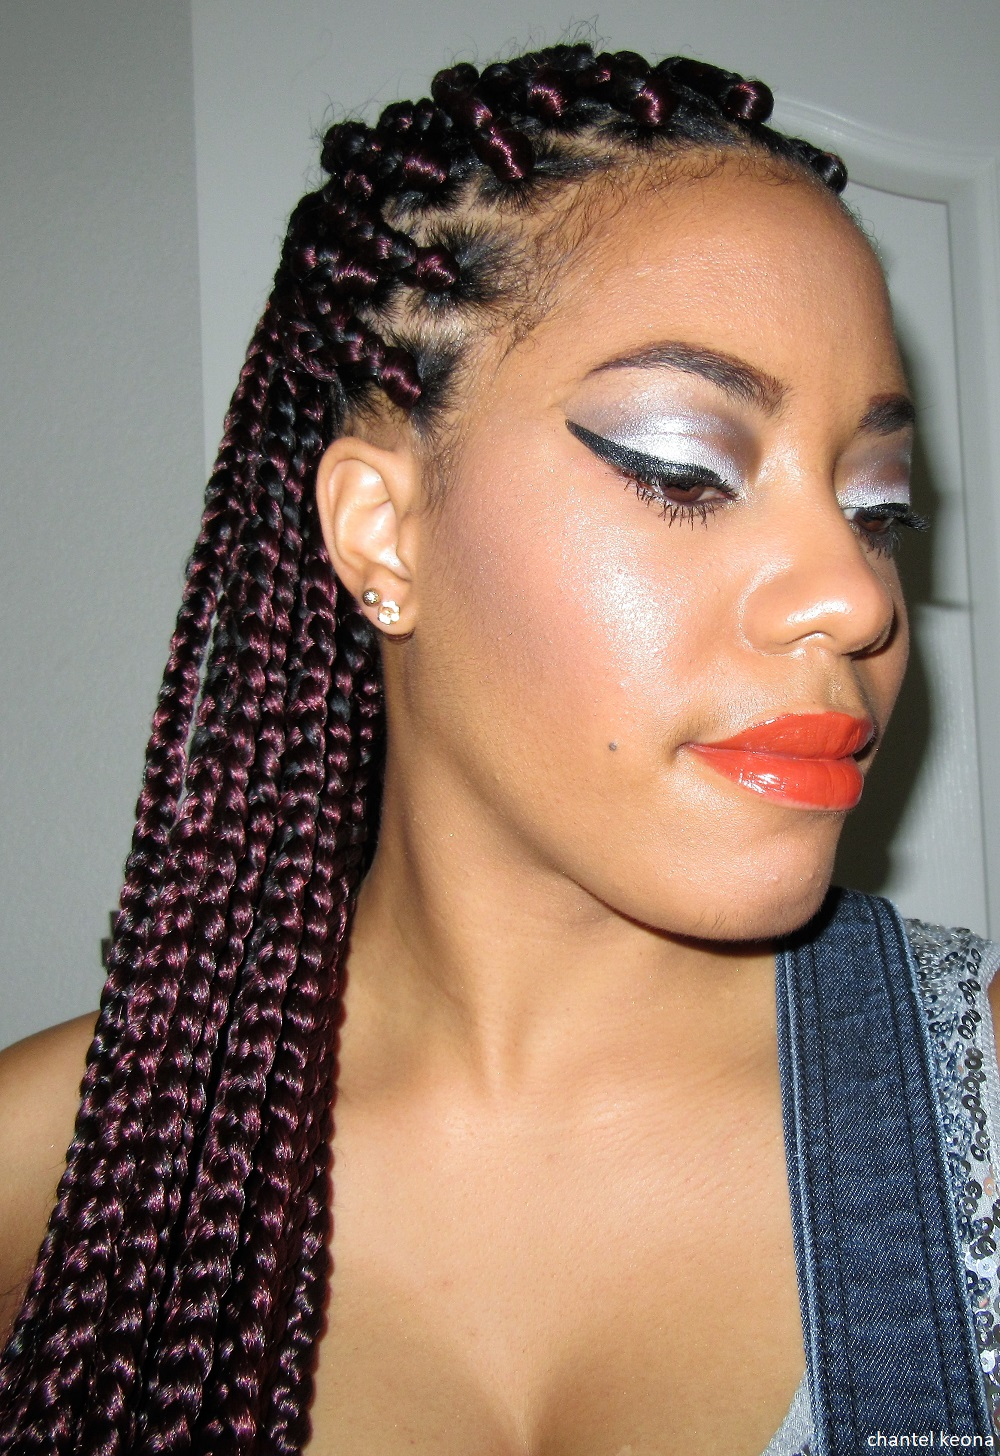 Bh Cosmetics X Carli Bybel Deluxe Edition 21 Color Eyeshadow